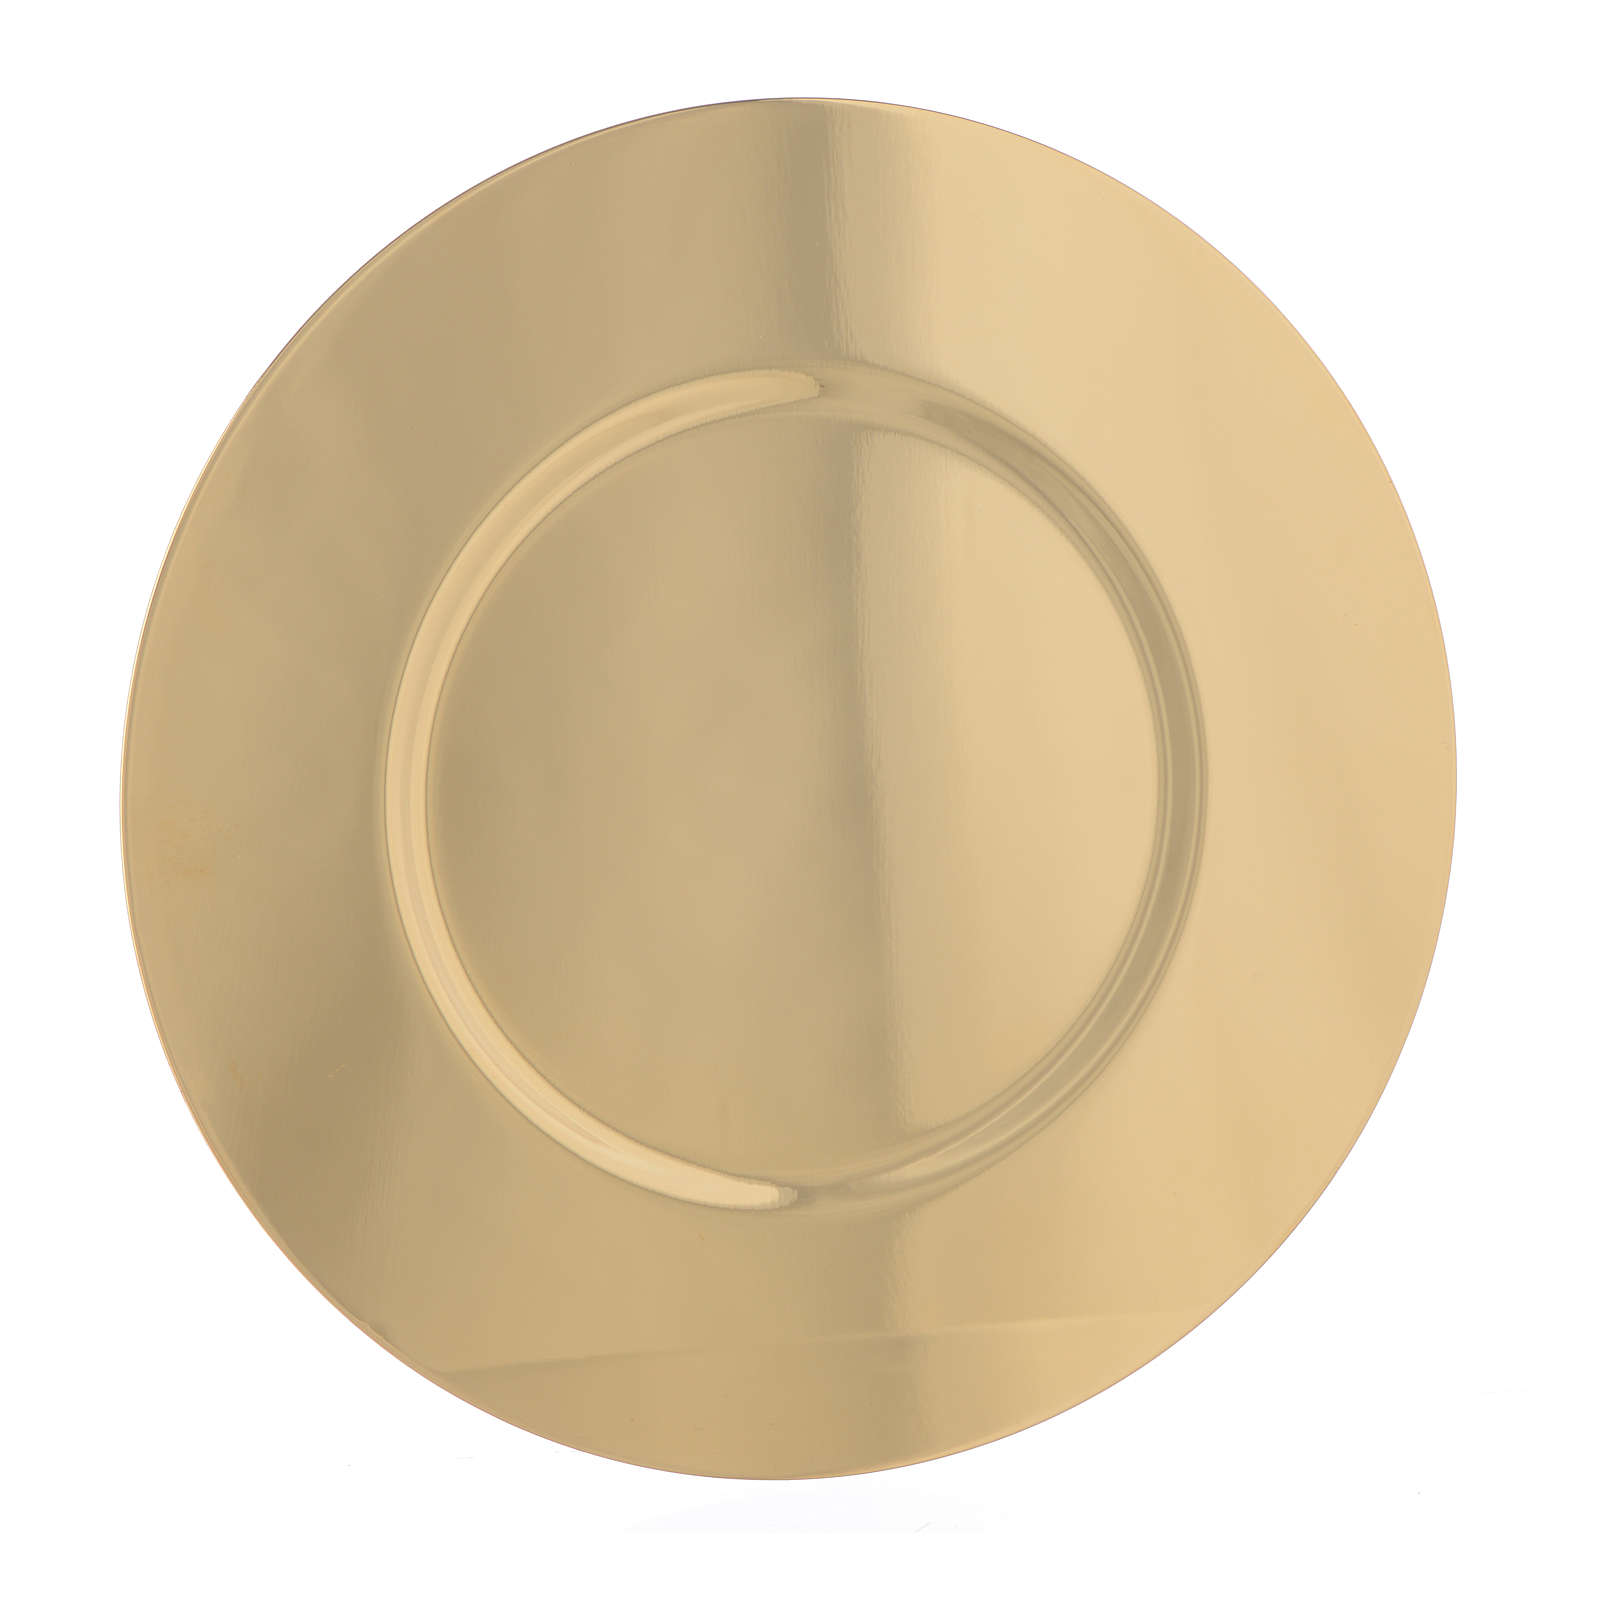 Patena ottone dorato sagomata diam cm 16,5 4